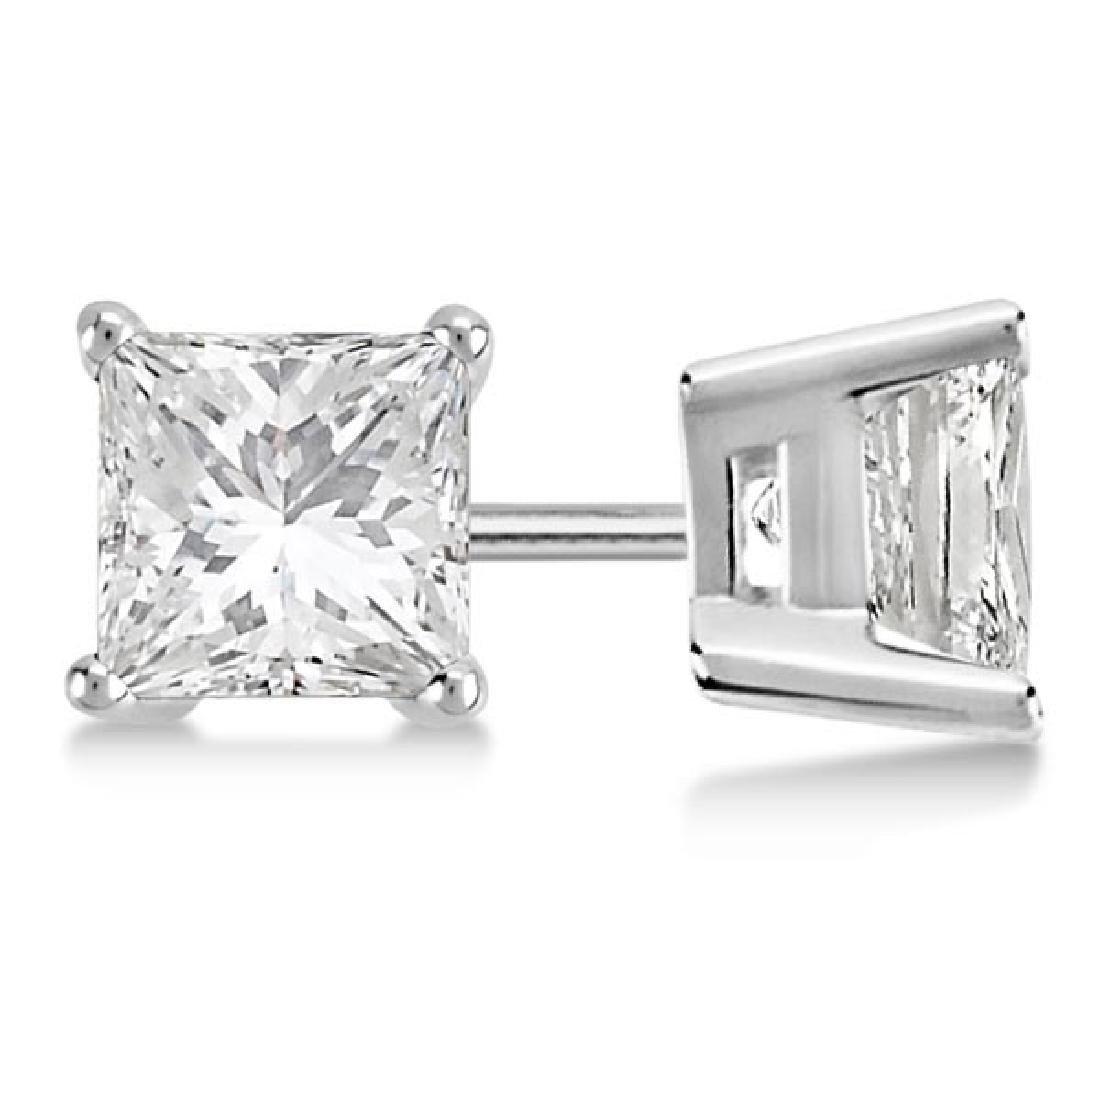 Certified 1.06 CTW Princess Diamond Stud Earrings E/SI2